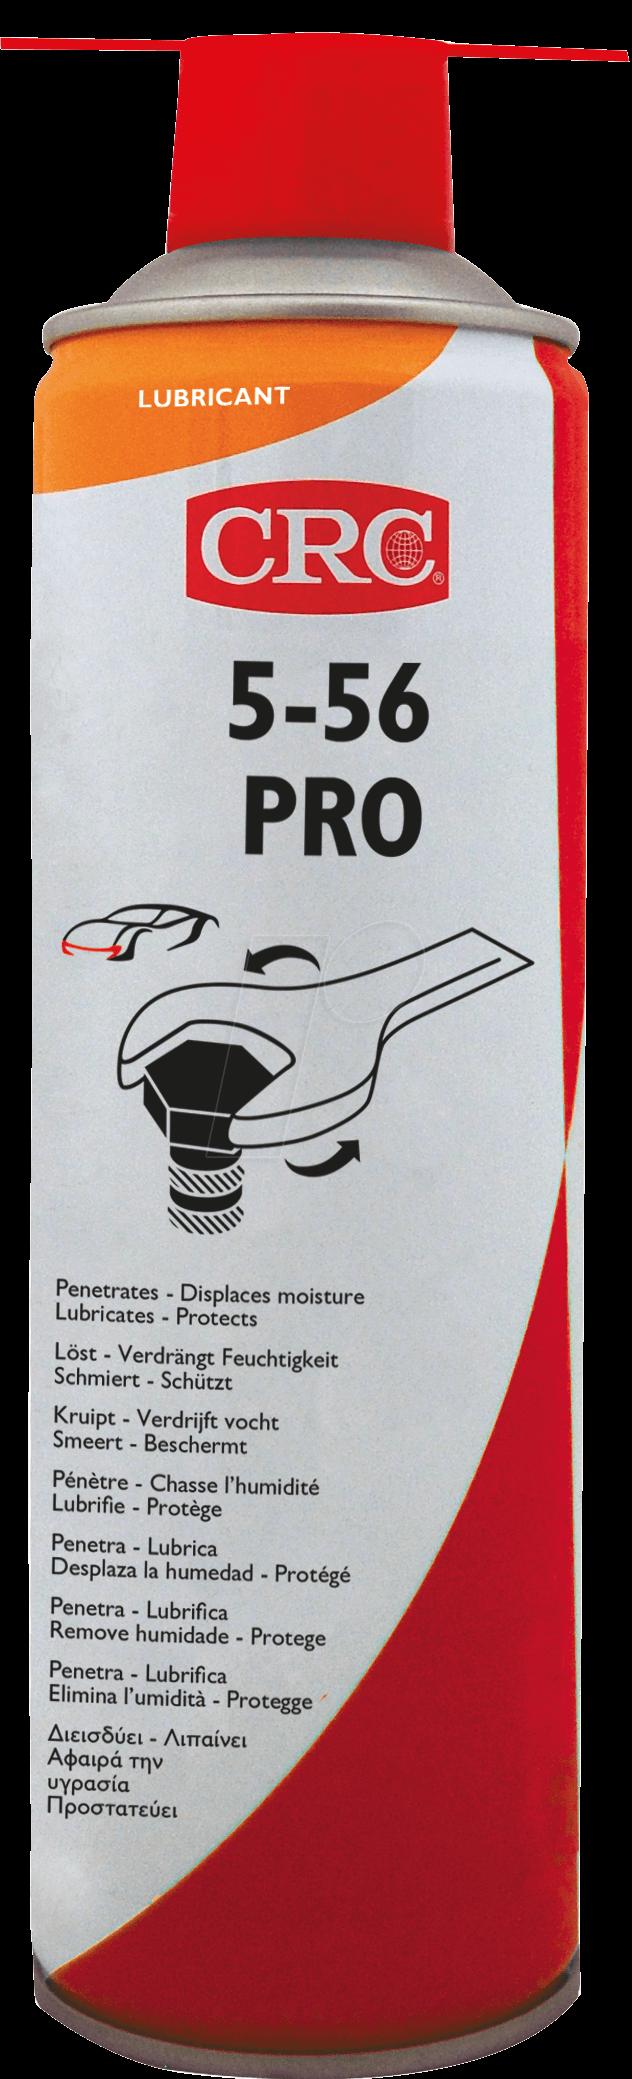 KONTAKT 32734 - CRC 5-56 pro, 500 ml — multi-purpose oil